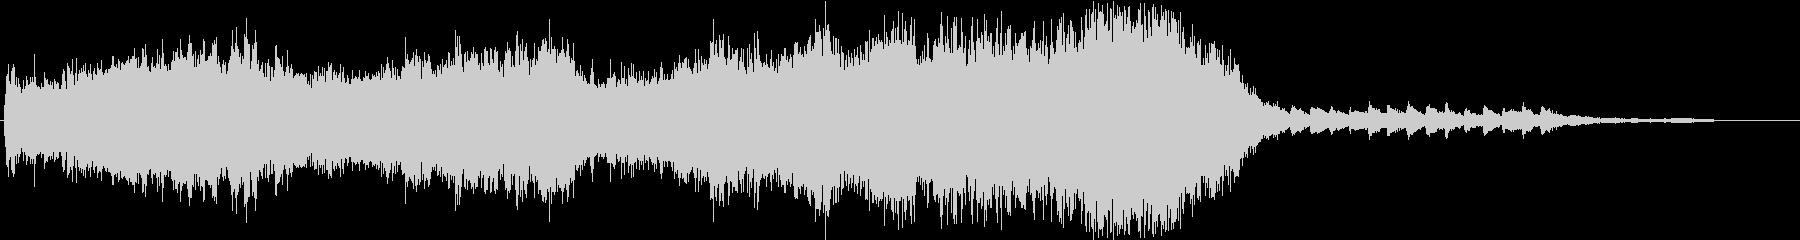 Cold Lake 30秒メロディー無しの未再生の波形